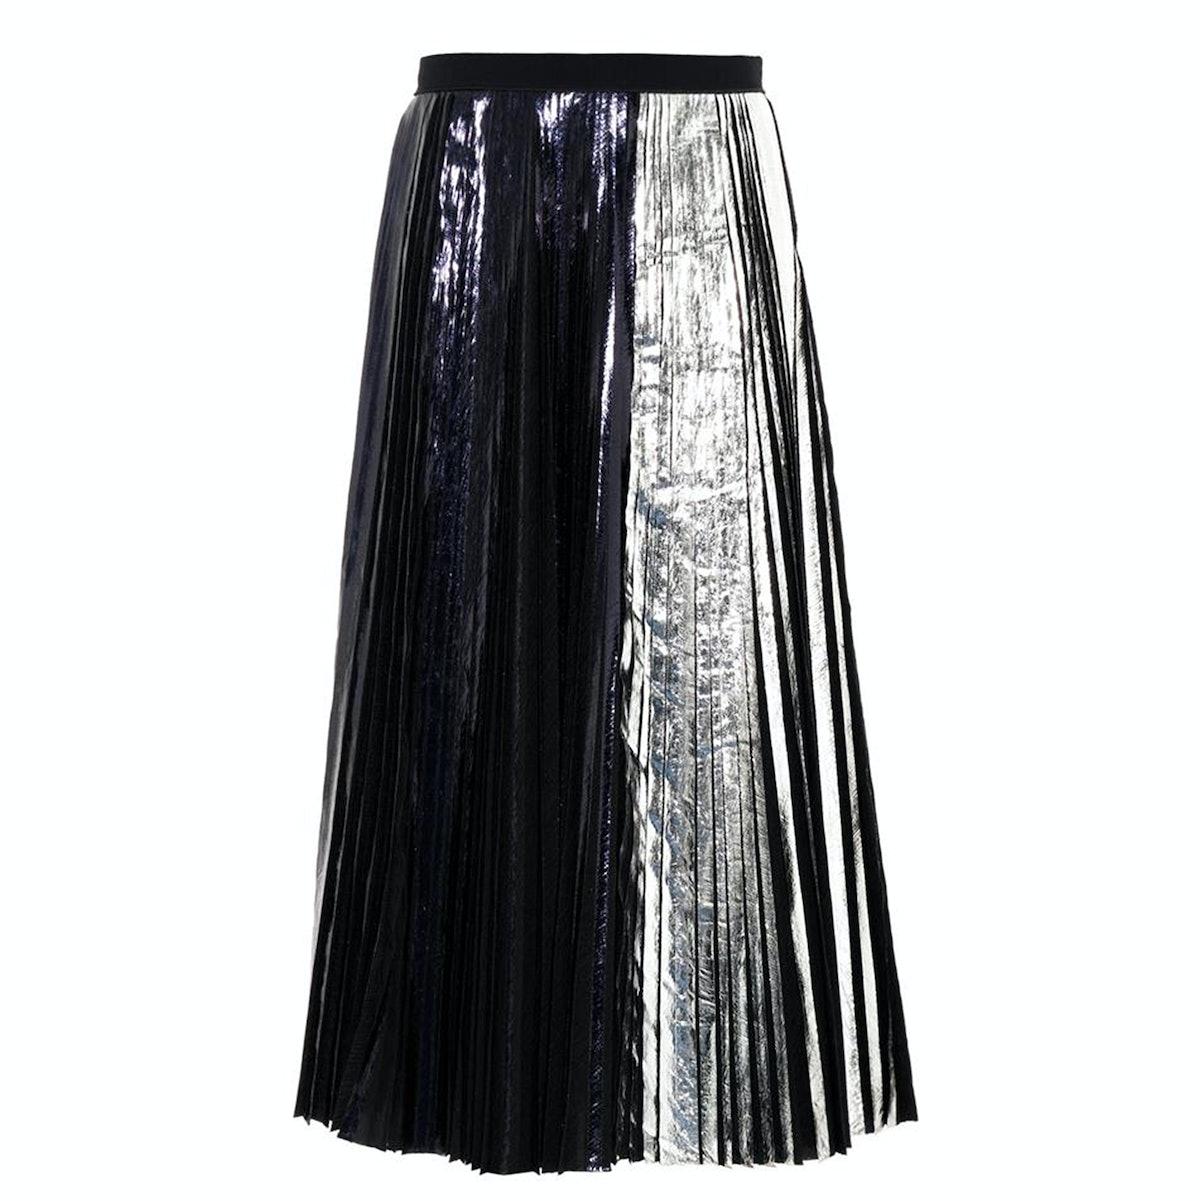 Proenza Schouler skirt